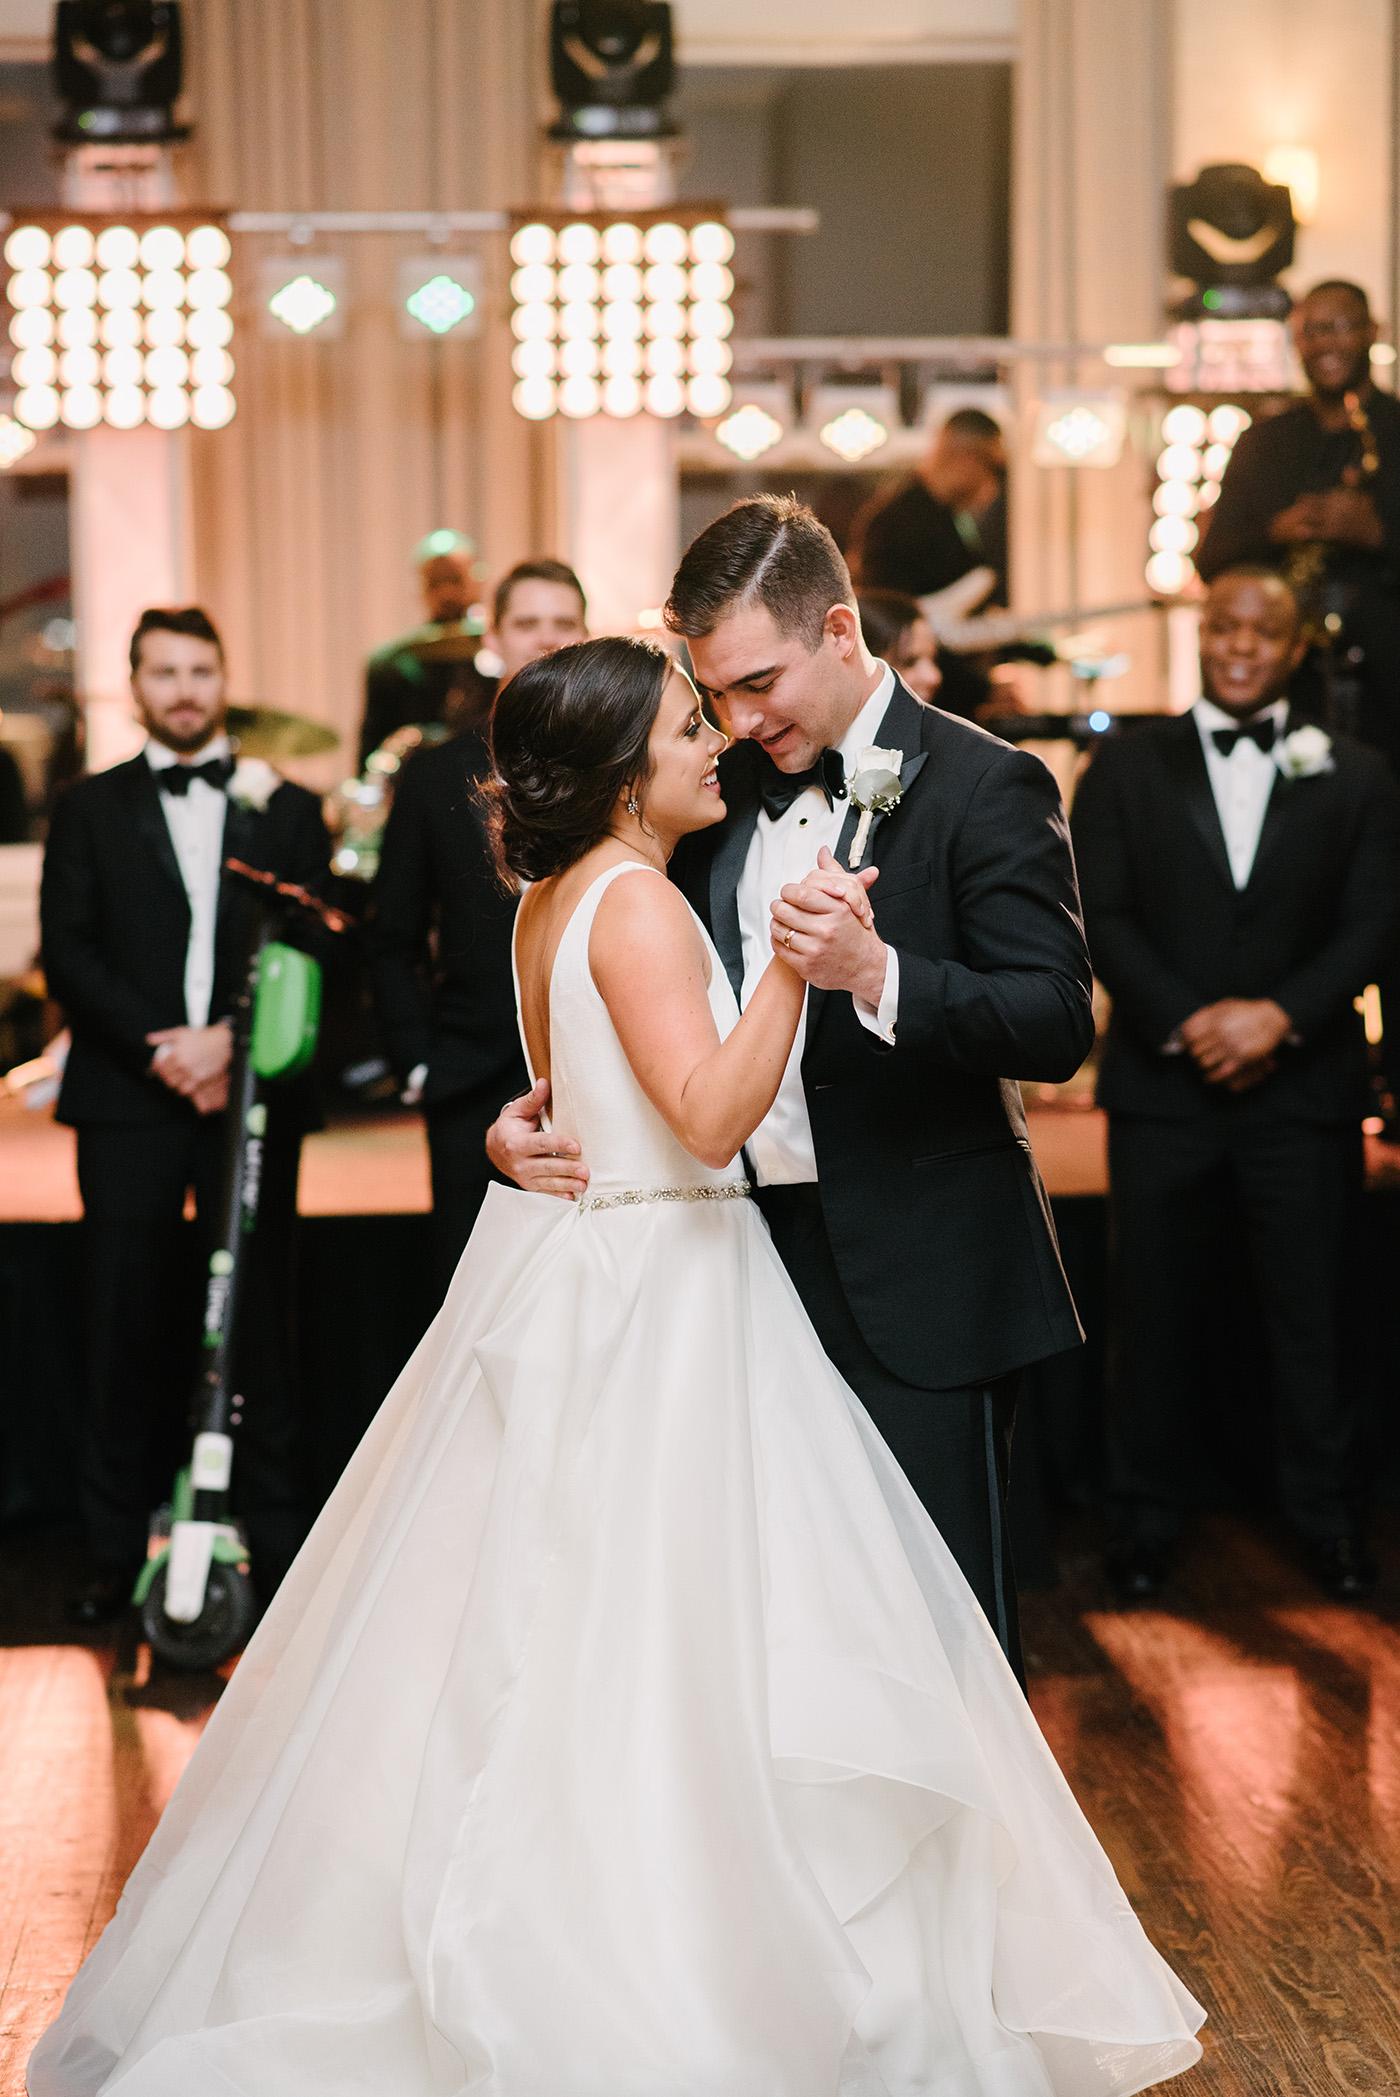 Dallas Wedding Planner - Winter Wedding at The Room on Main - Allday Events - 74.jpg